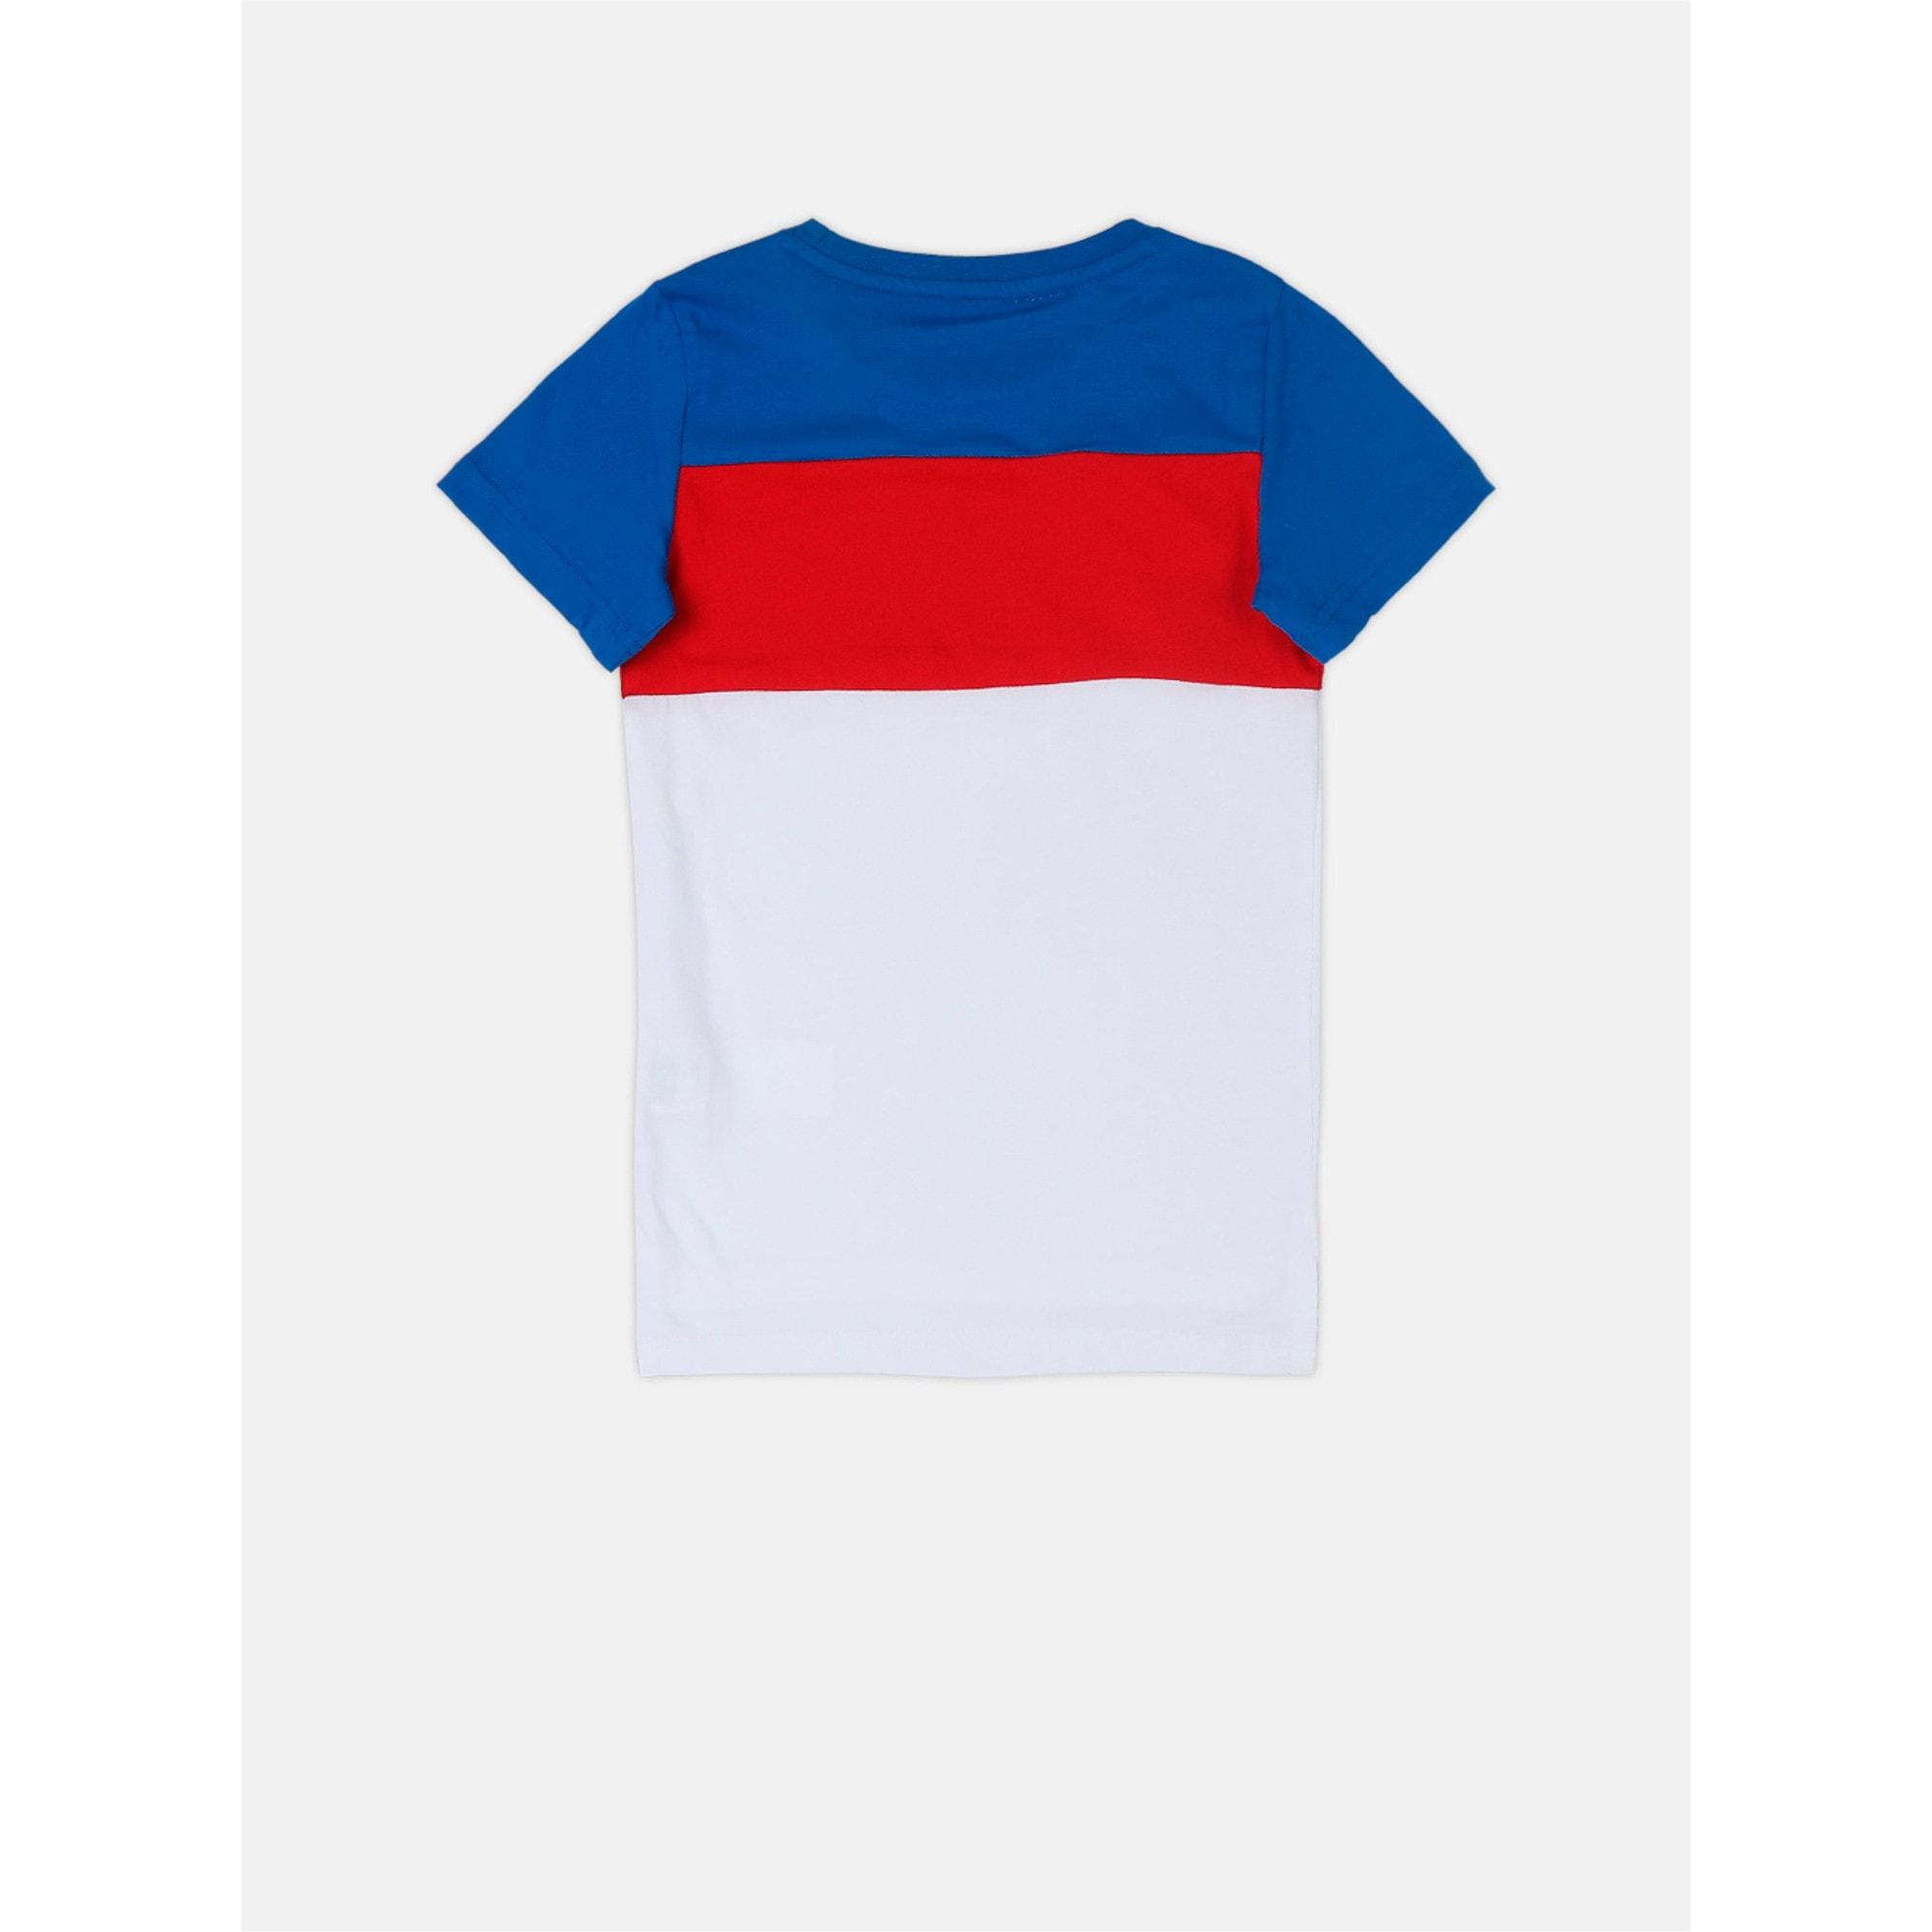 Thumbnail 3 of Boys' T-Shirt, Puma White, medium-IND